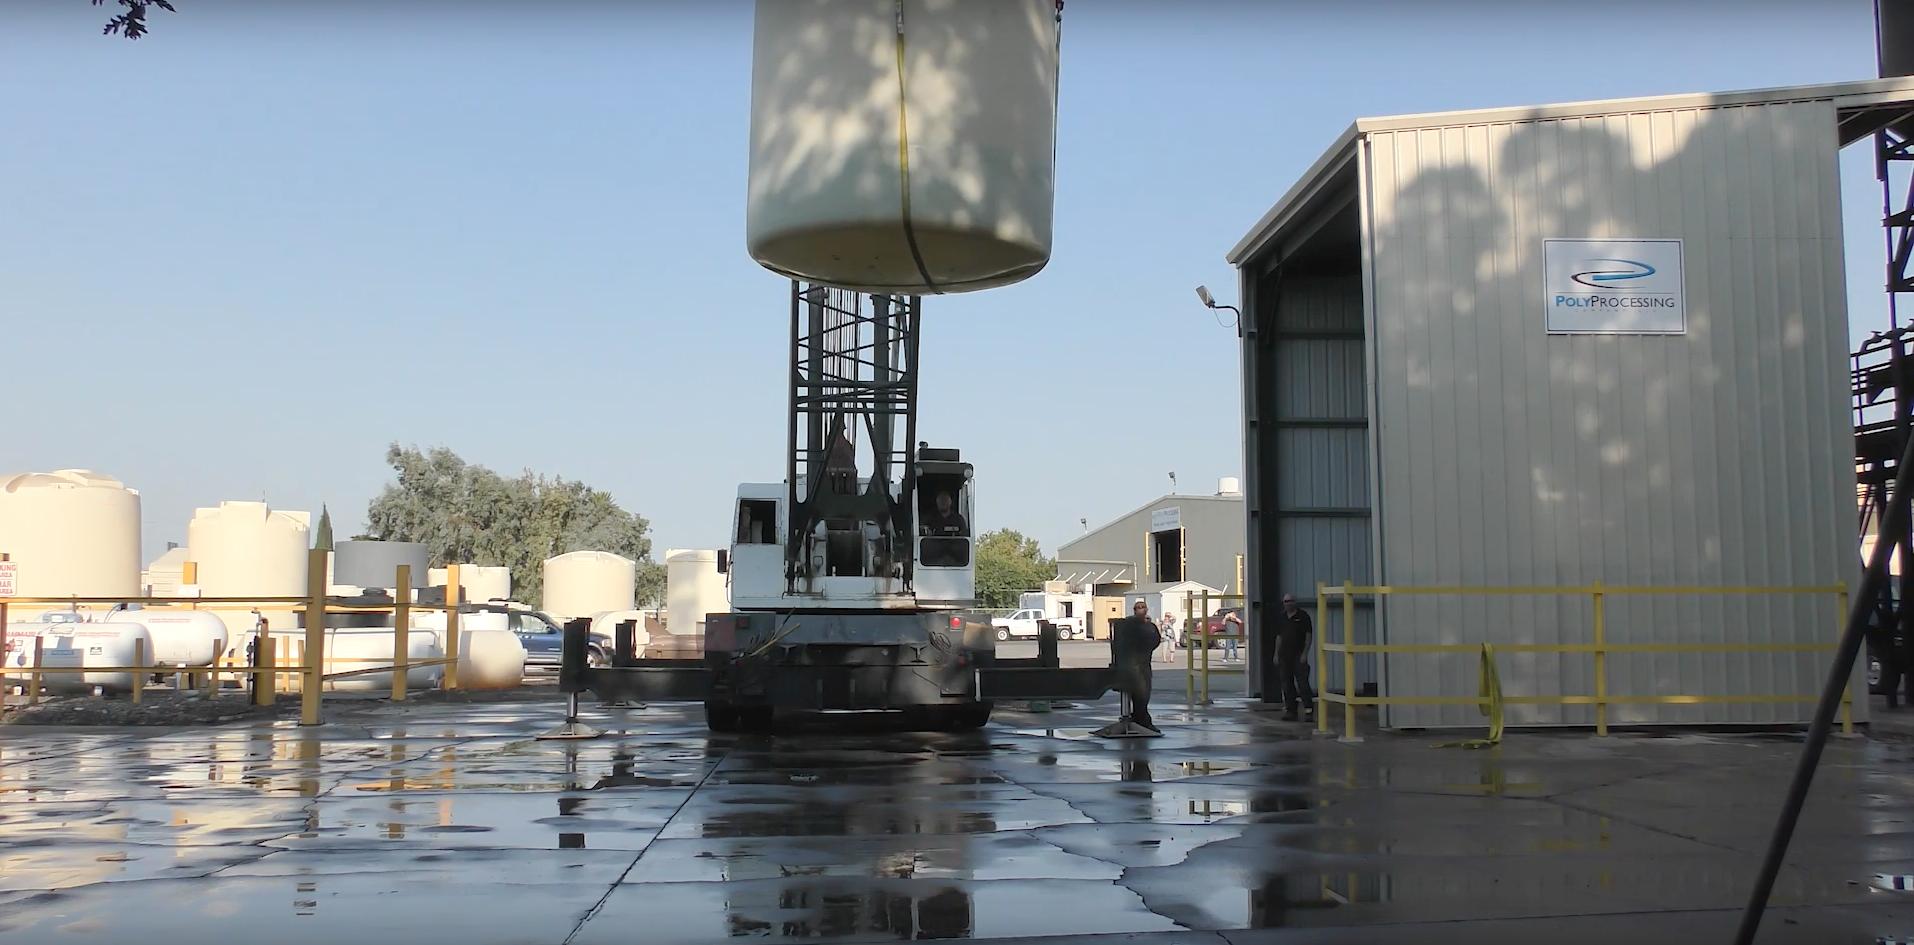 Poly Processing XLPE tank